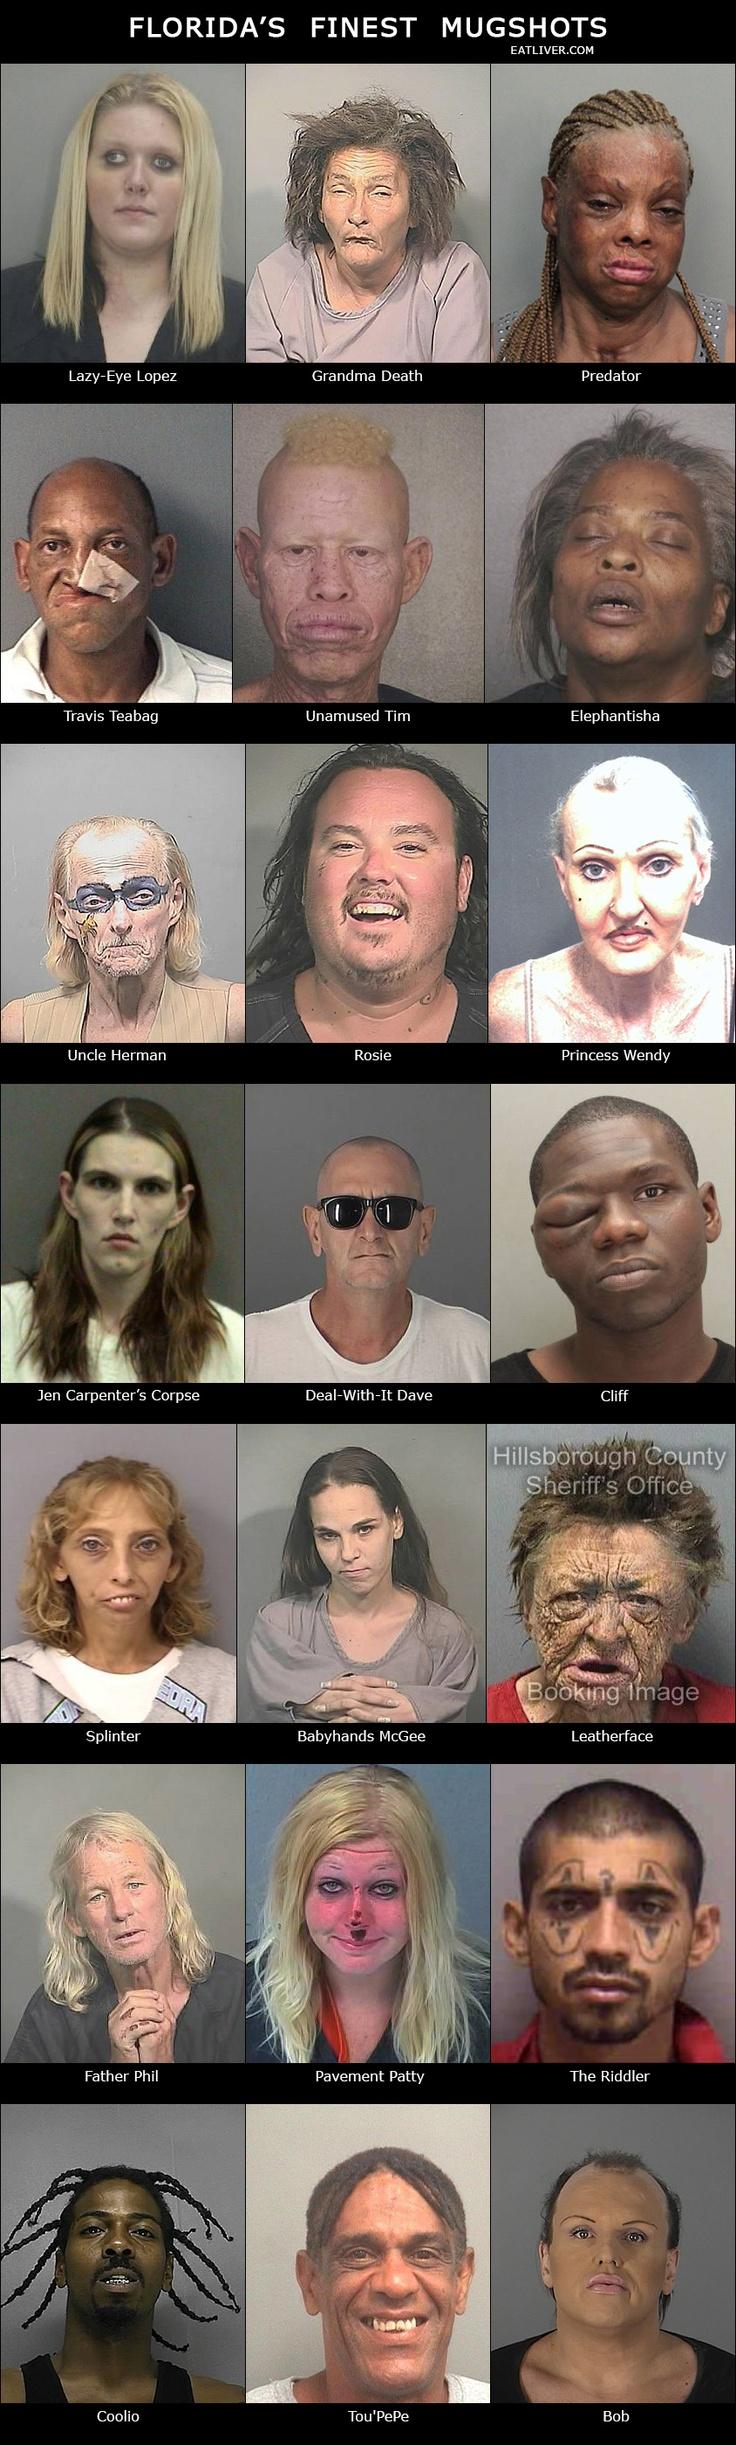 Florida's finest mugshots